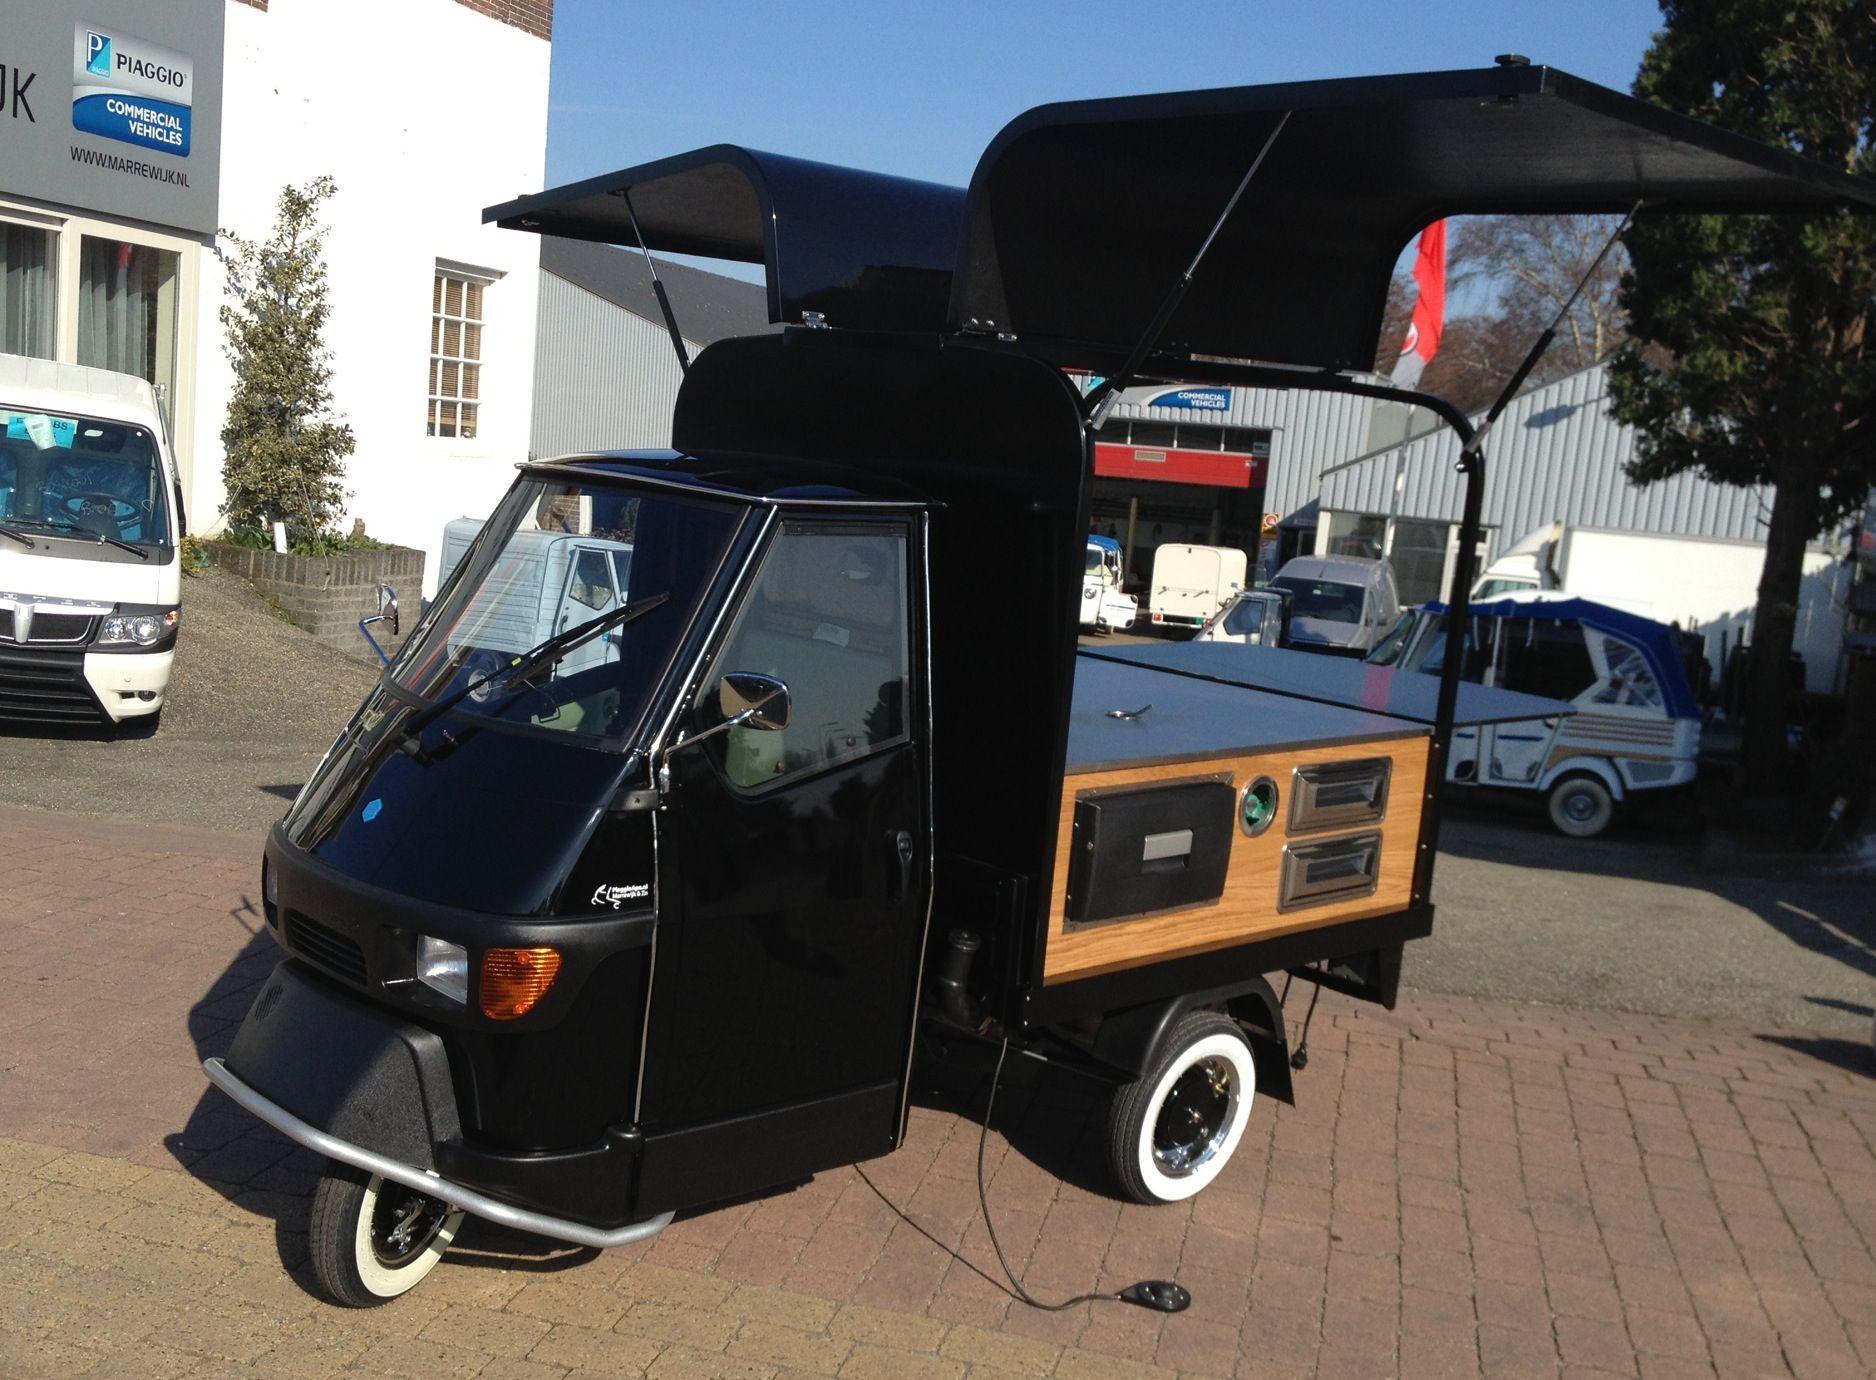 piaggio ape 50 food truck food. Black Bedroom Furniture Sets. Home Design Ideas